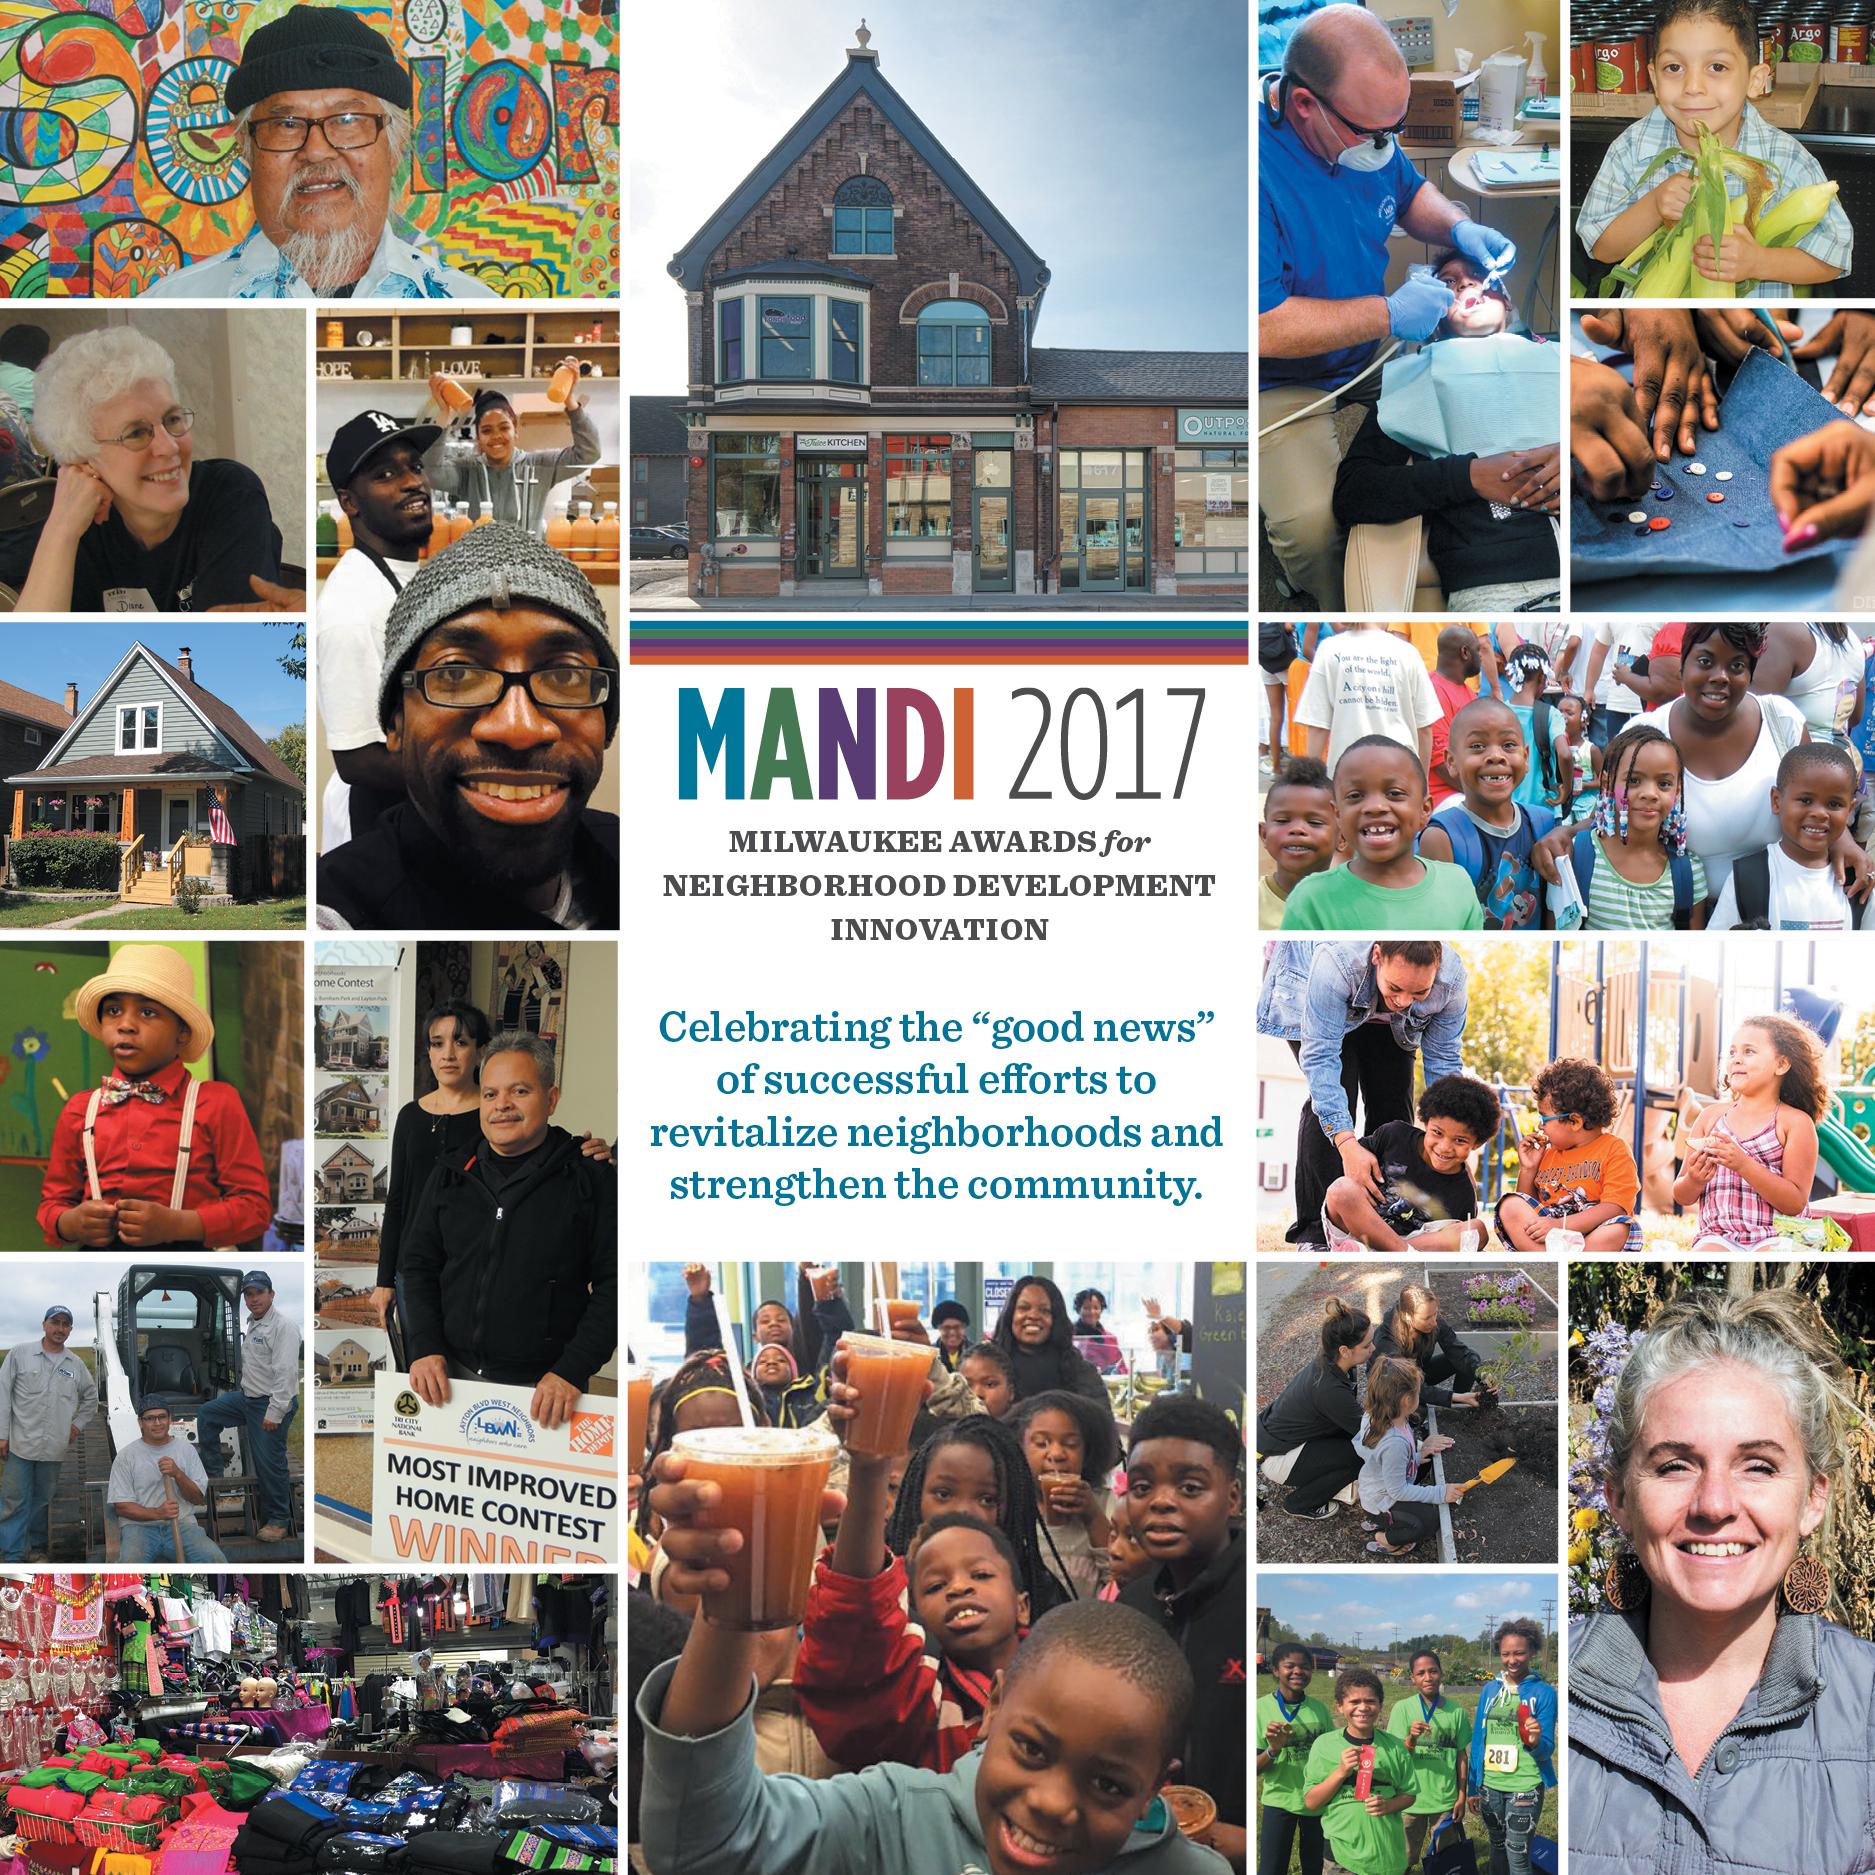 MANDI2017_radio-mke_900x900